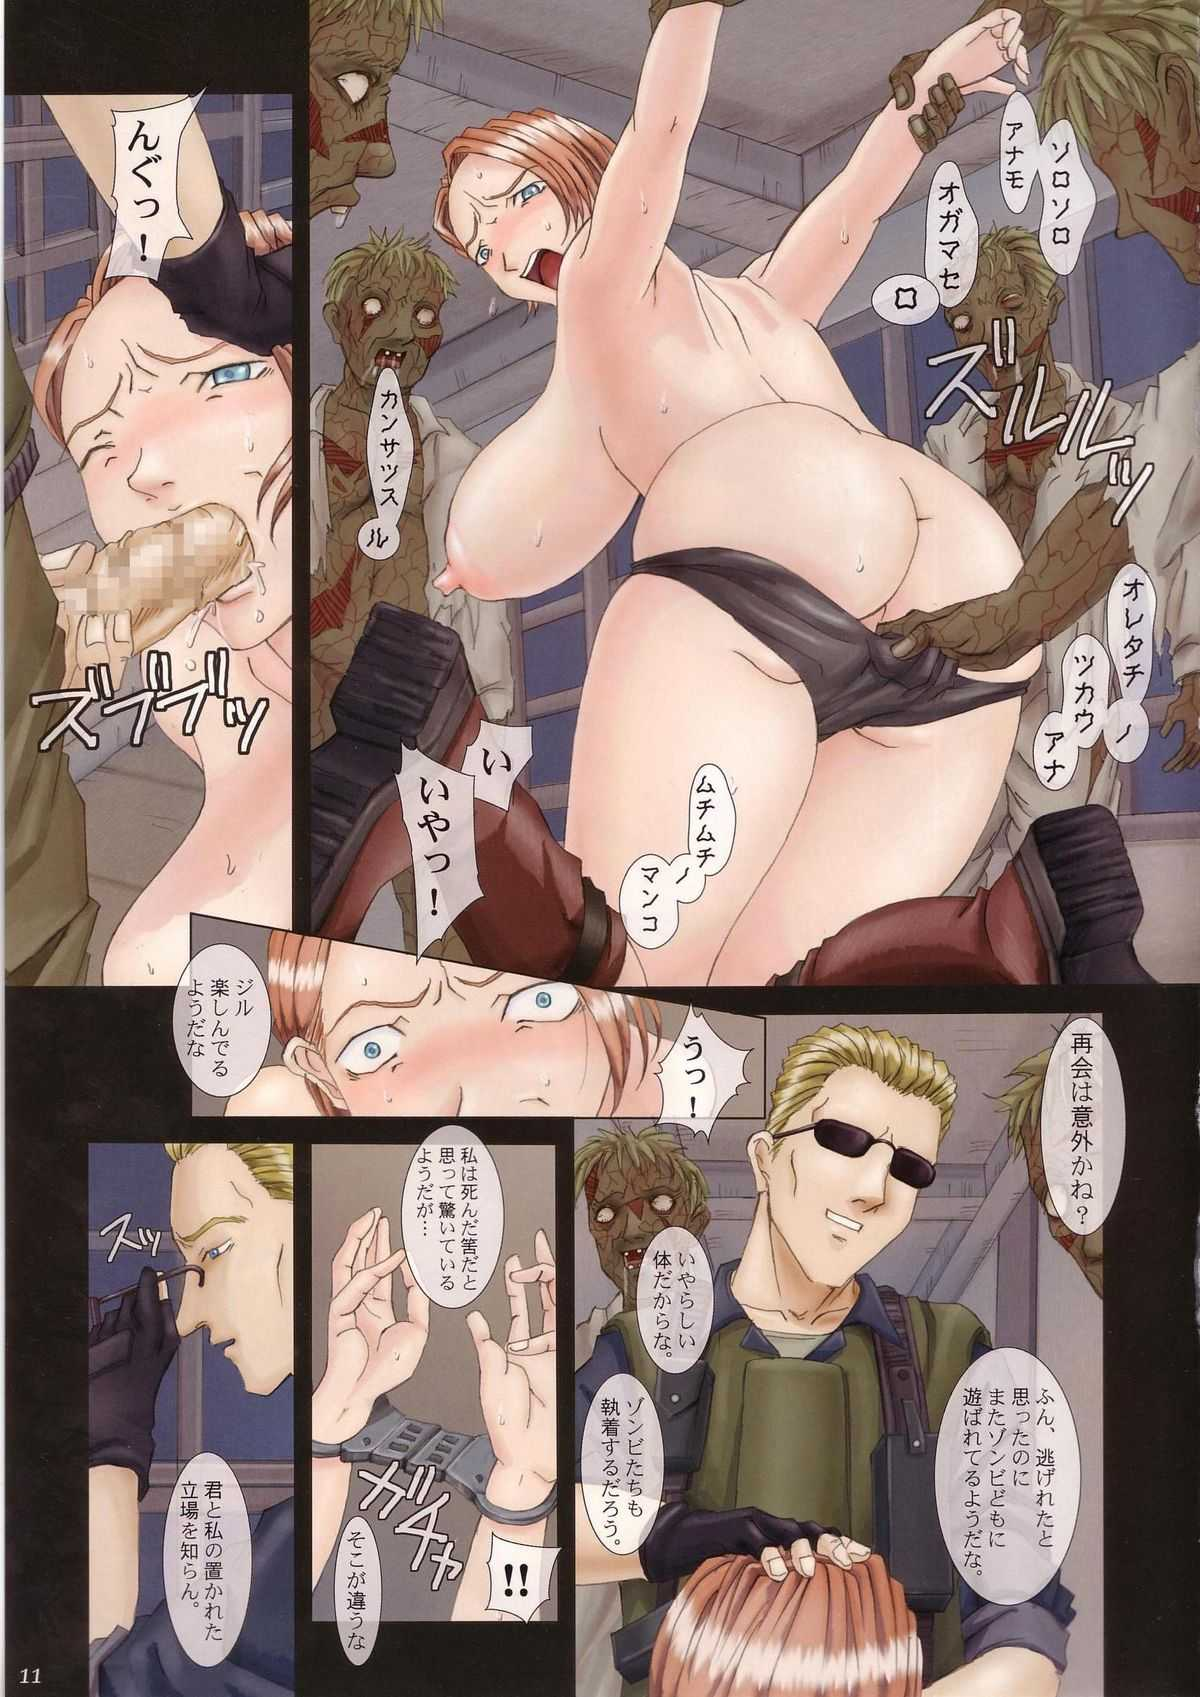 Hentai manga resident evil 3d xxx movie